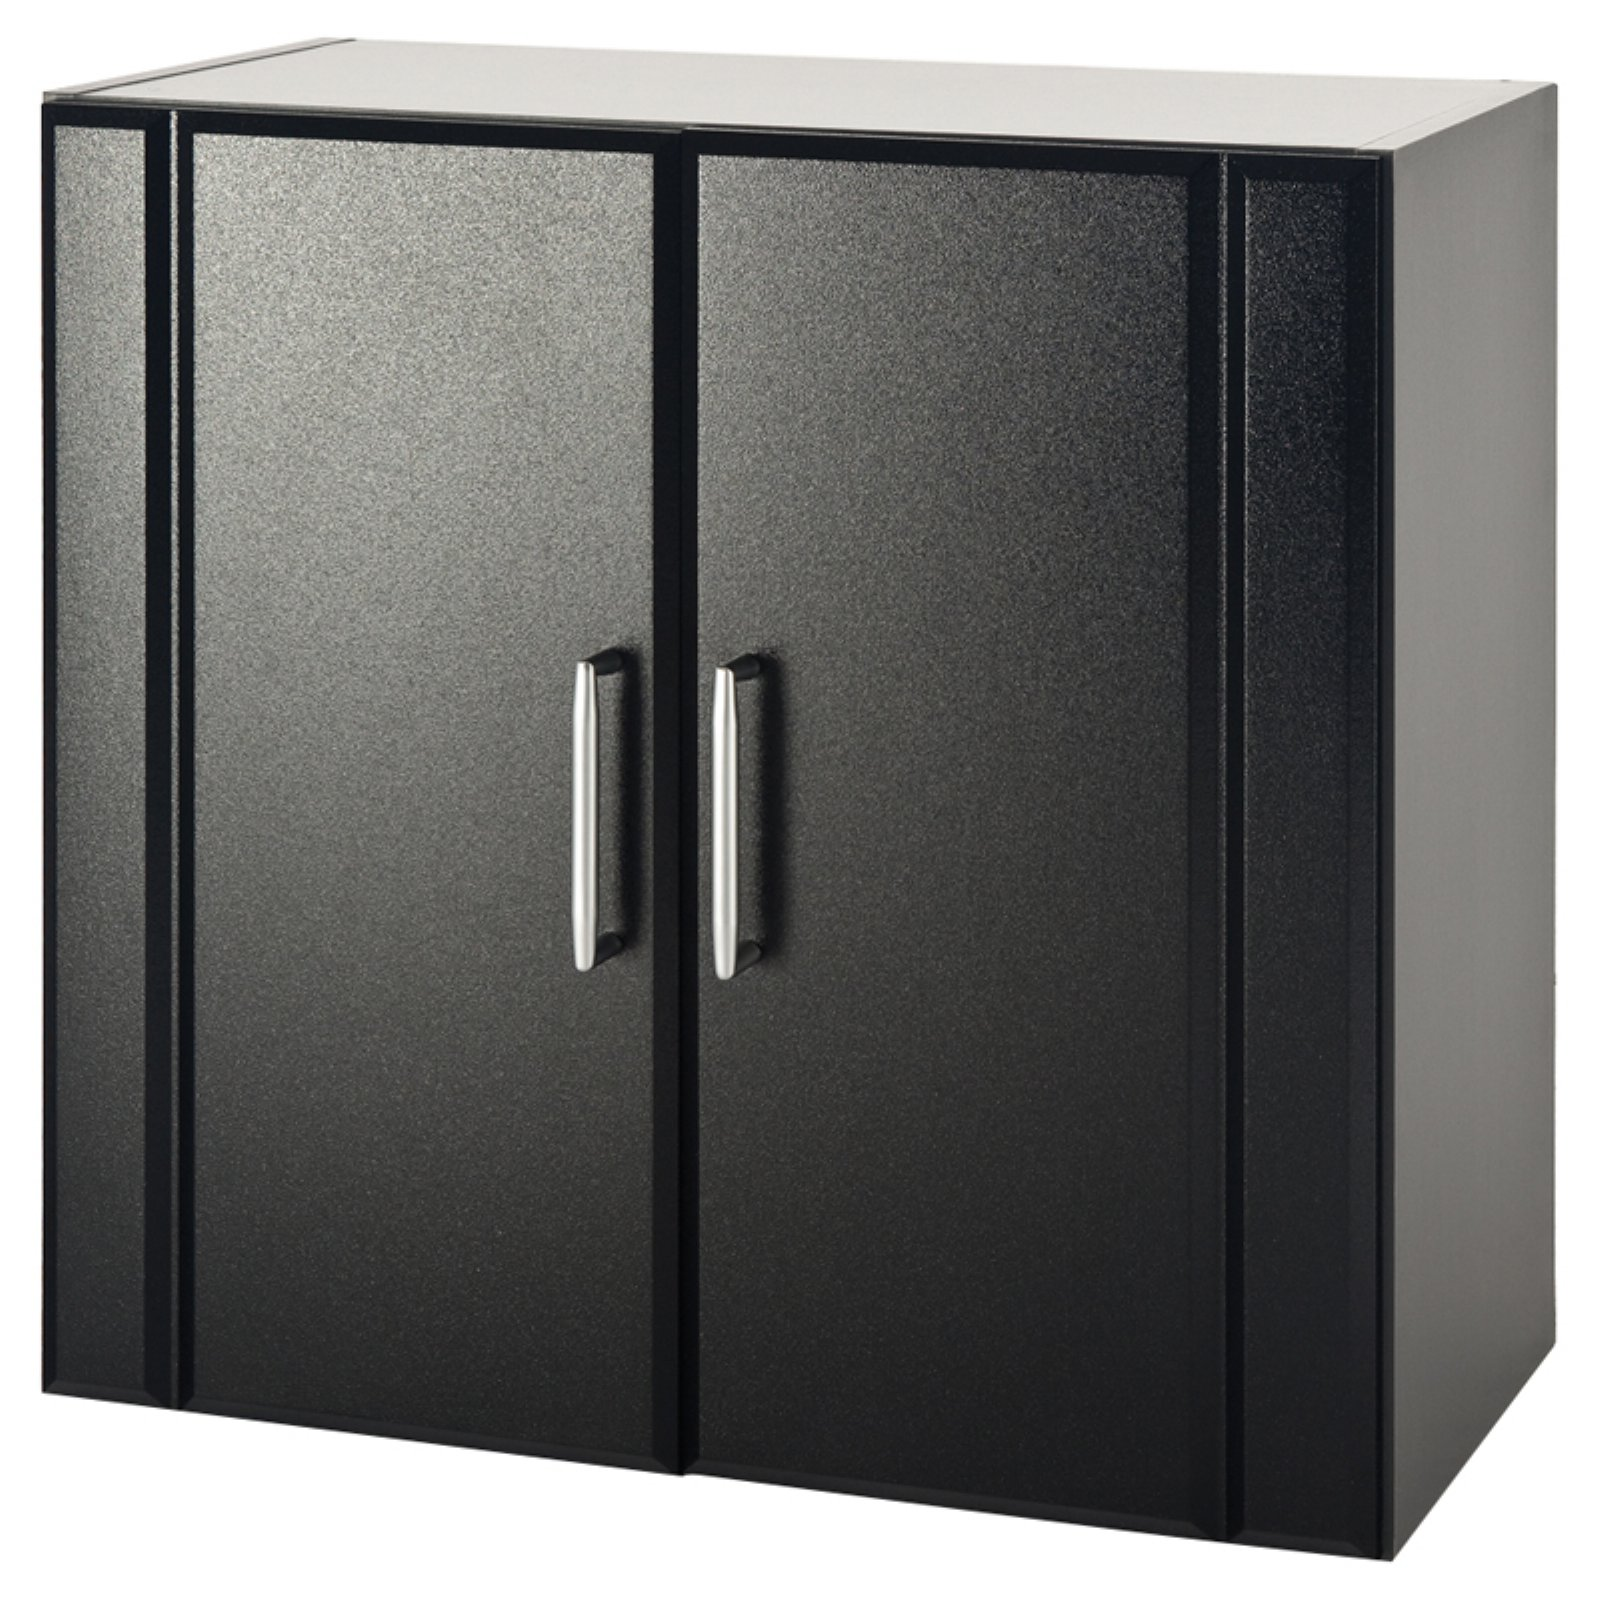 ClosetMaid 2 Door Wall Cabinet With Adjustable Shelf